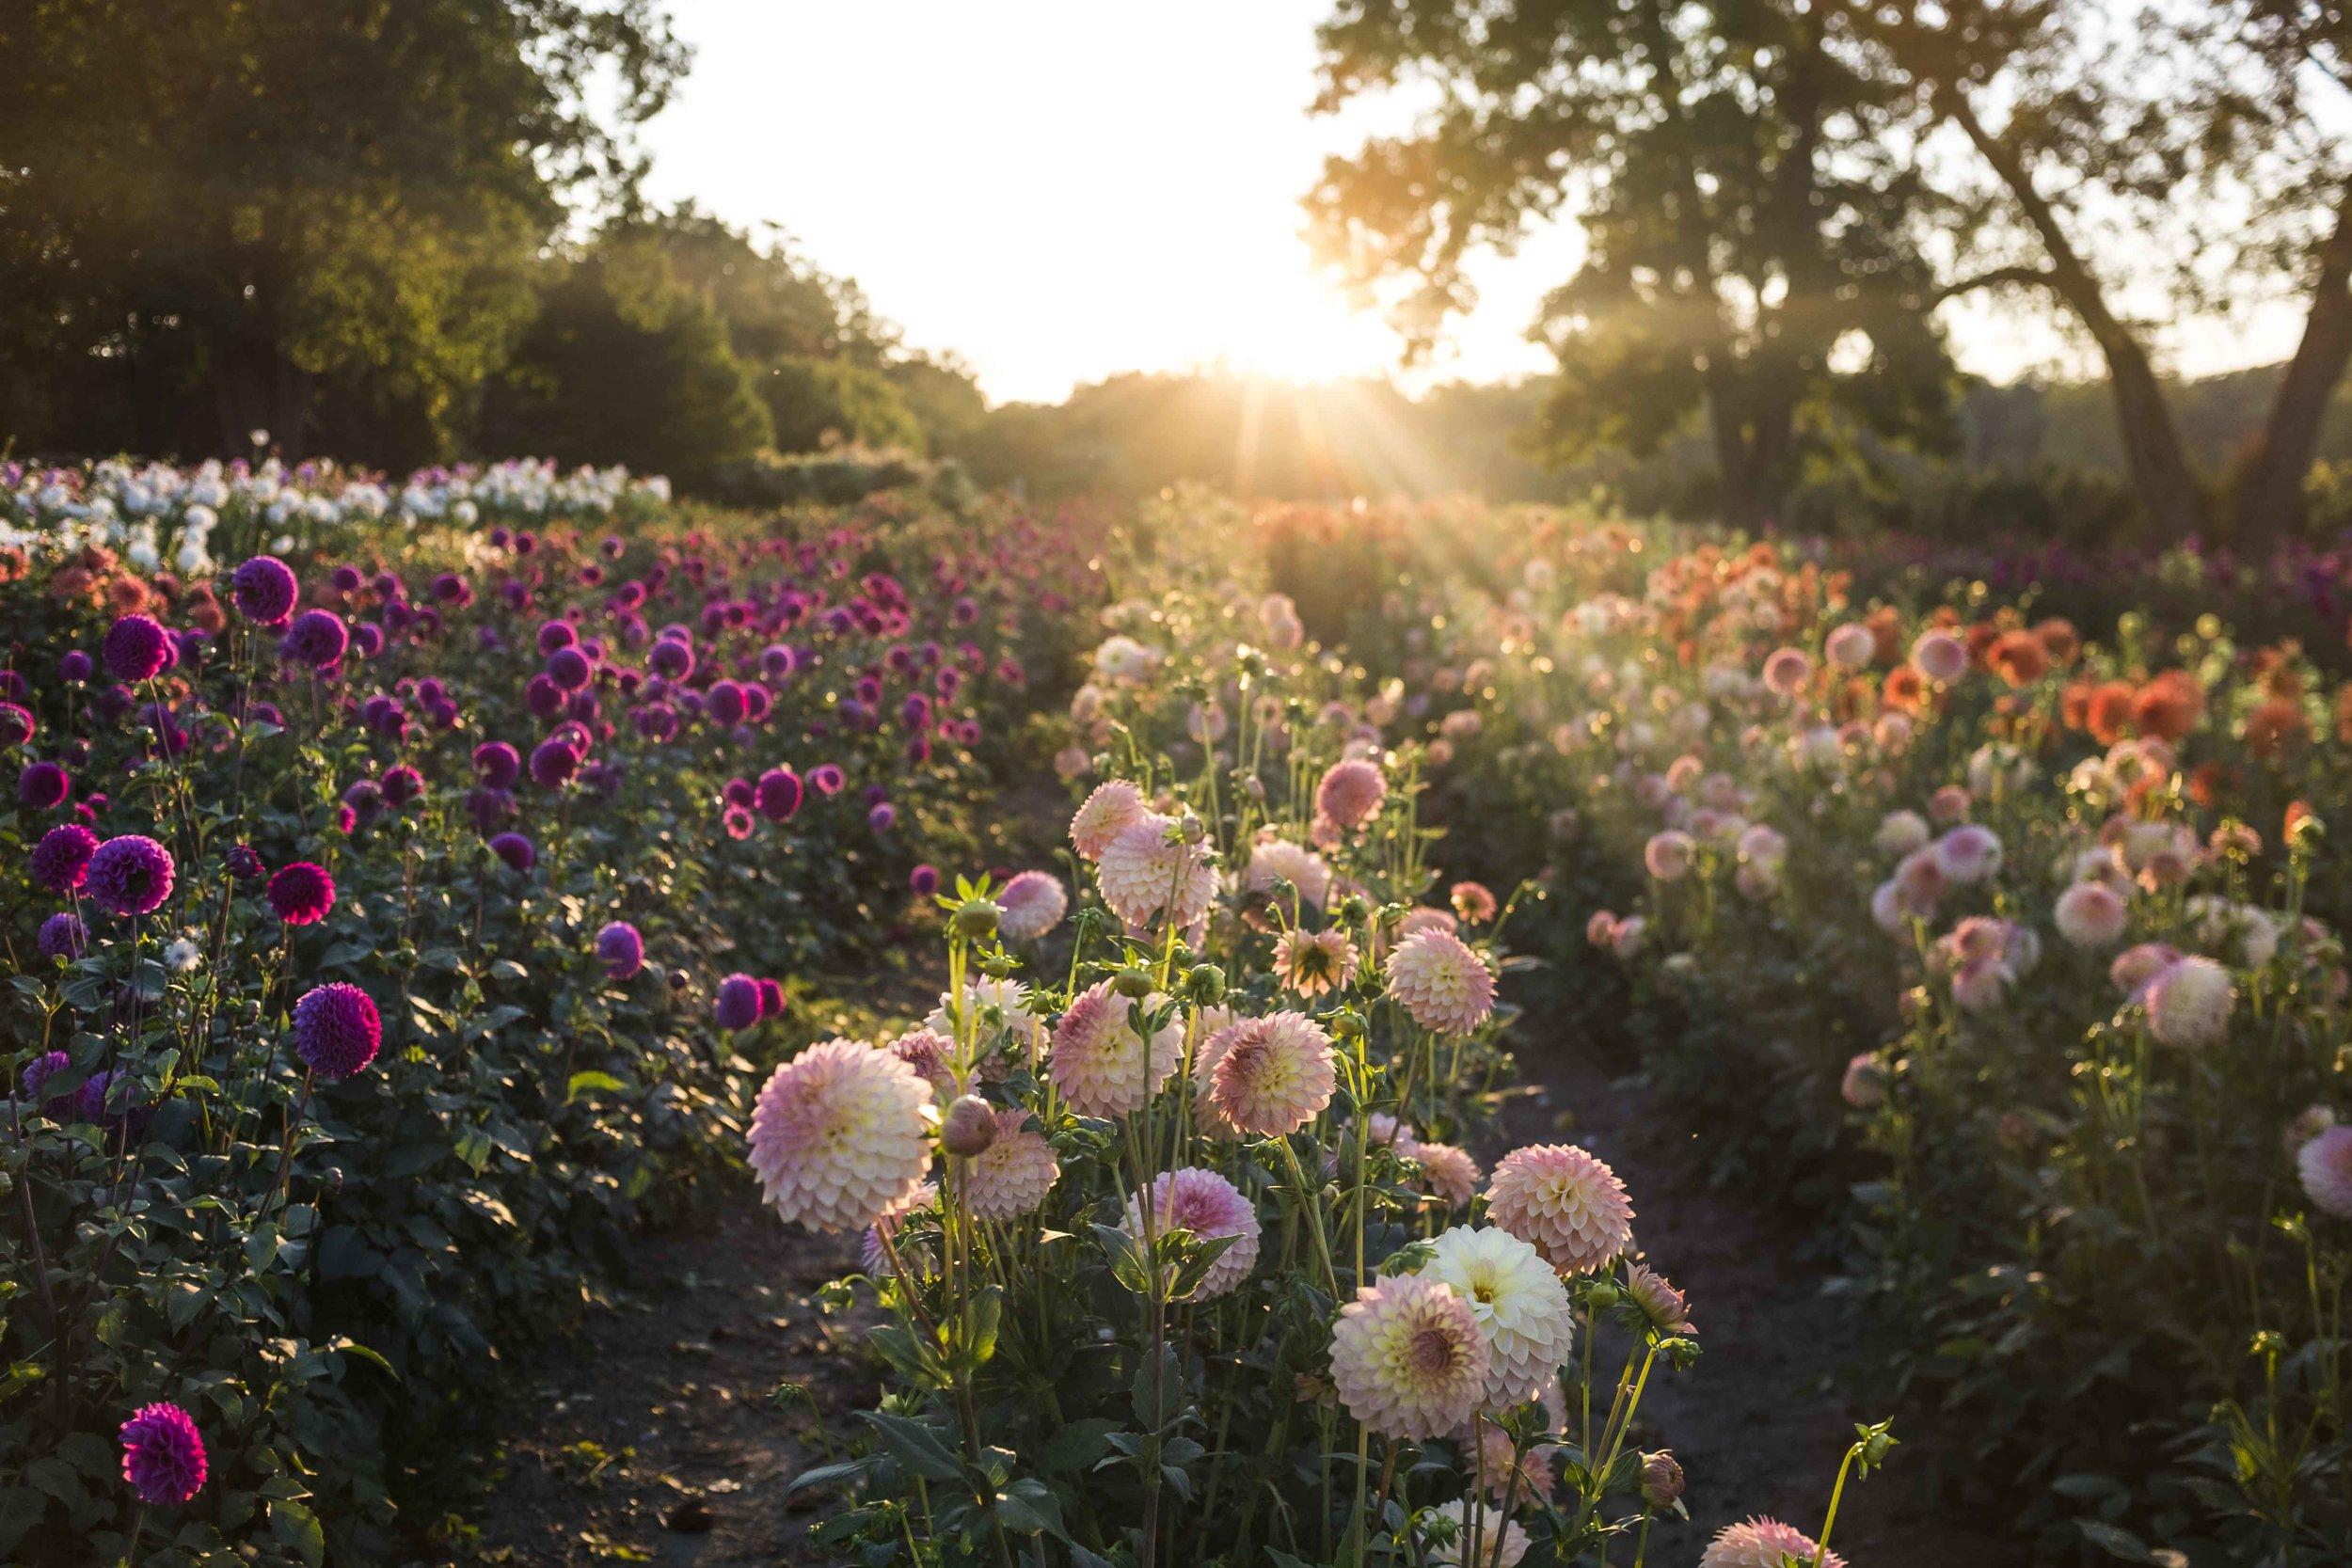 Summer Dreams Farm Dahlia Field